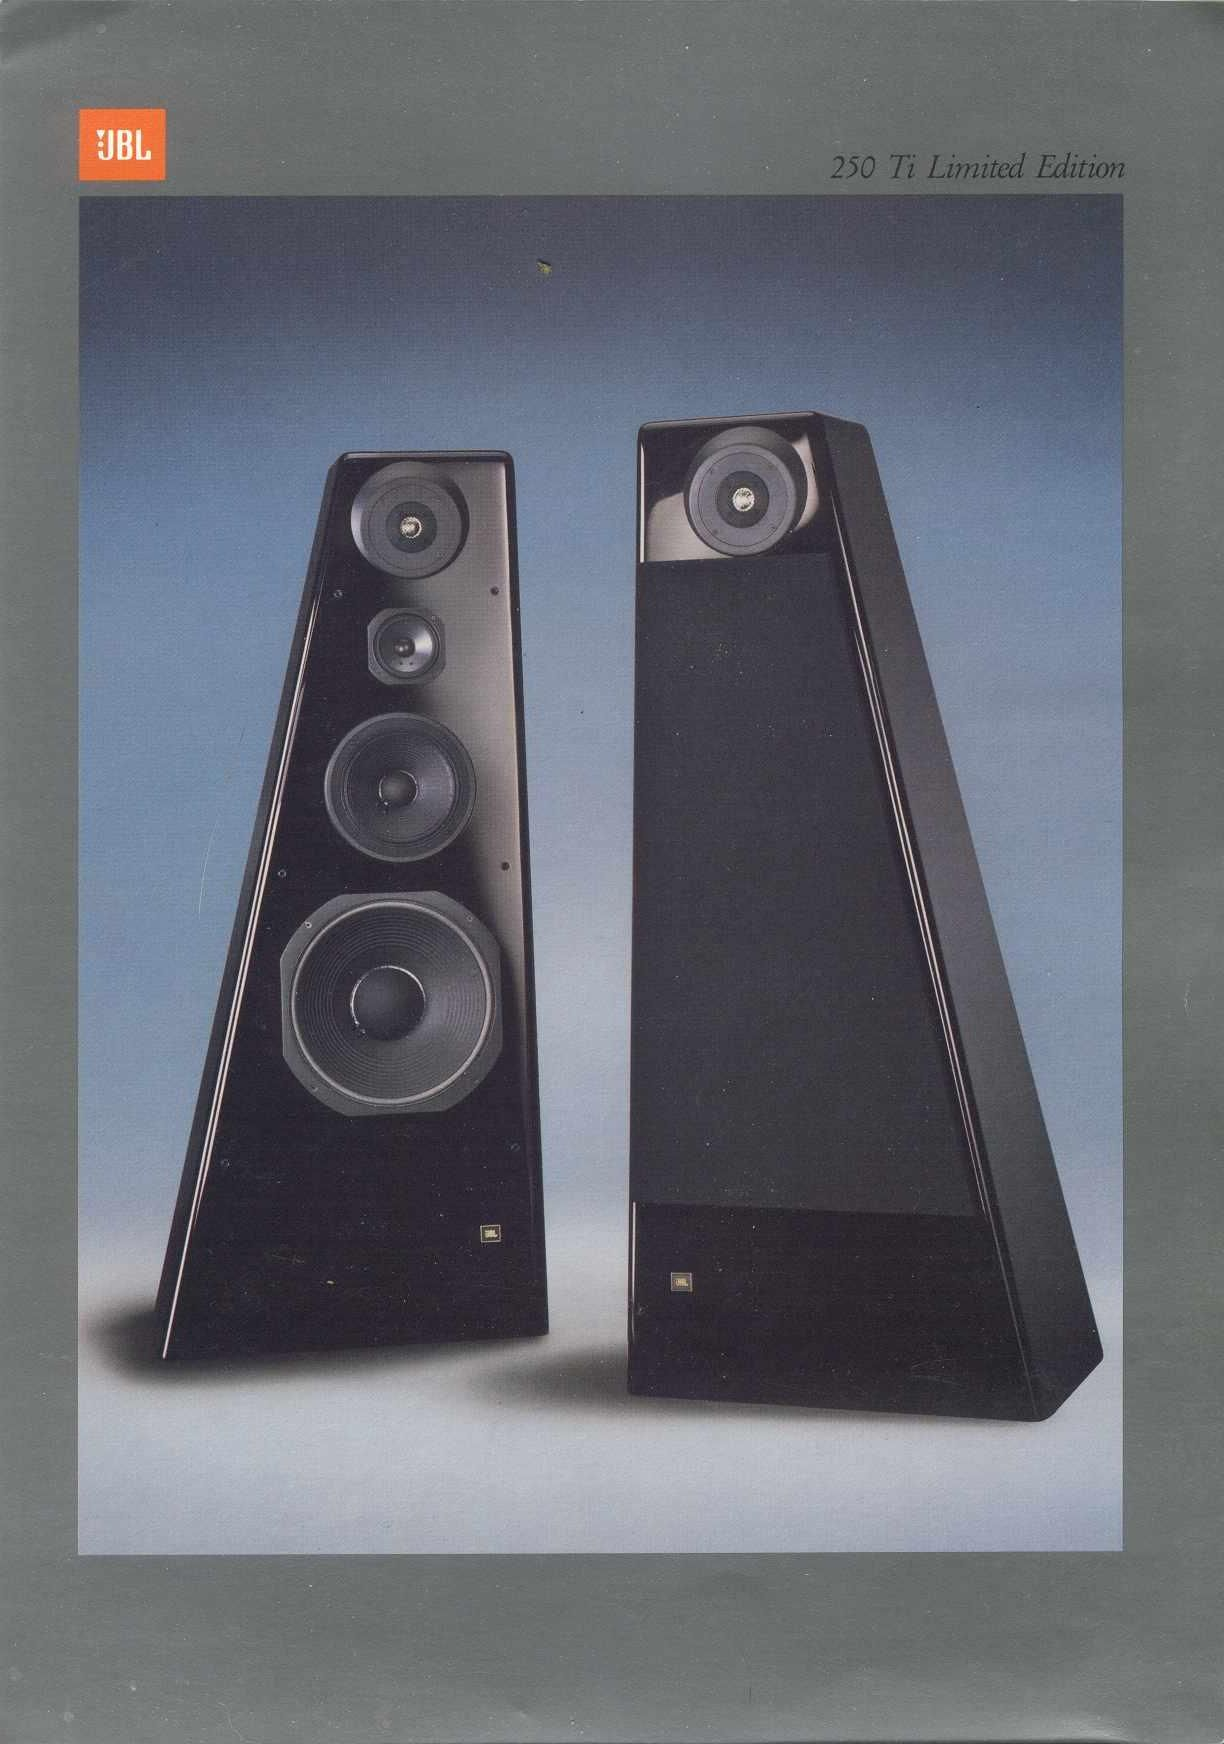 jbl 250 ti limited edition vintage hifi catalog picture. Black Bedroom Furniture Sets. Home Design Ideas